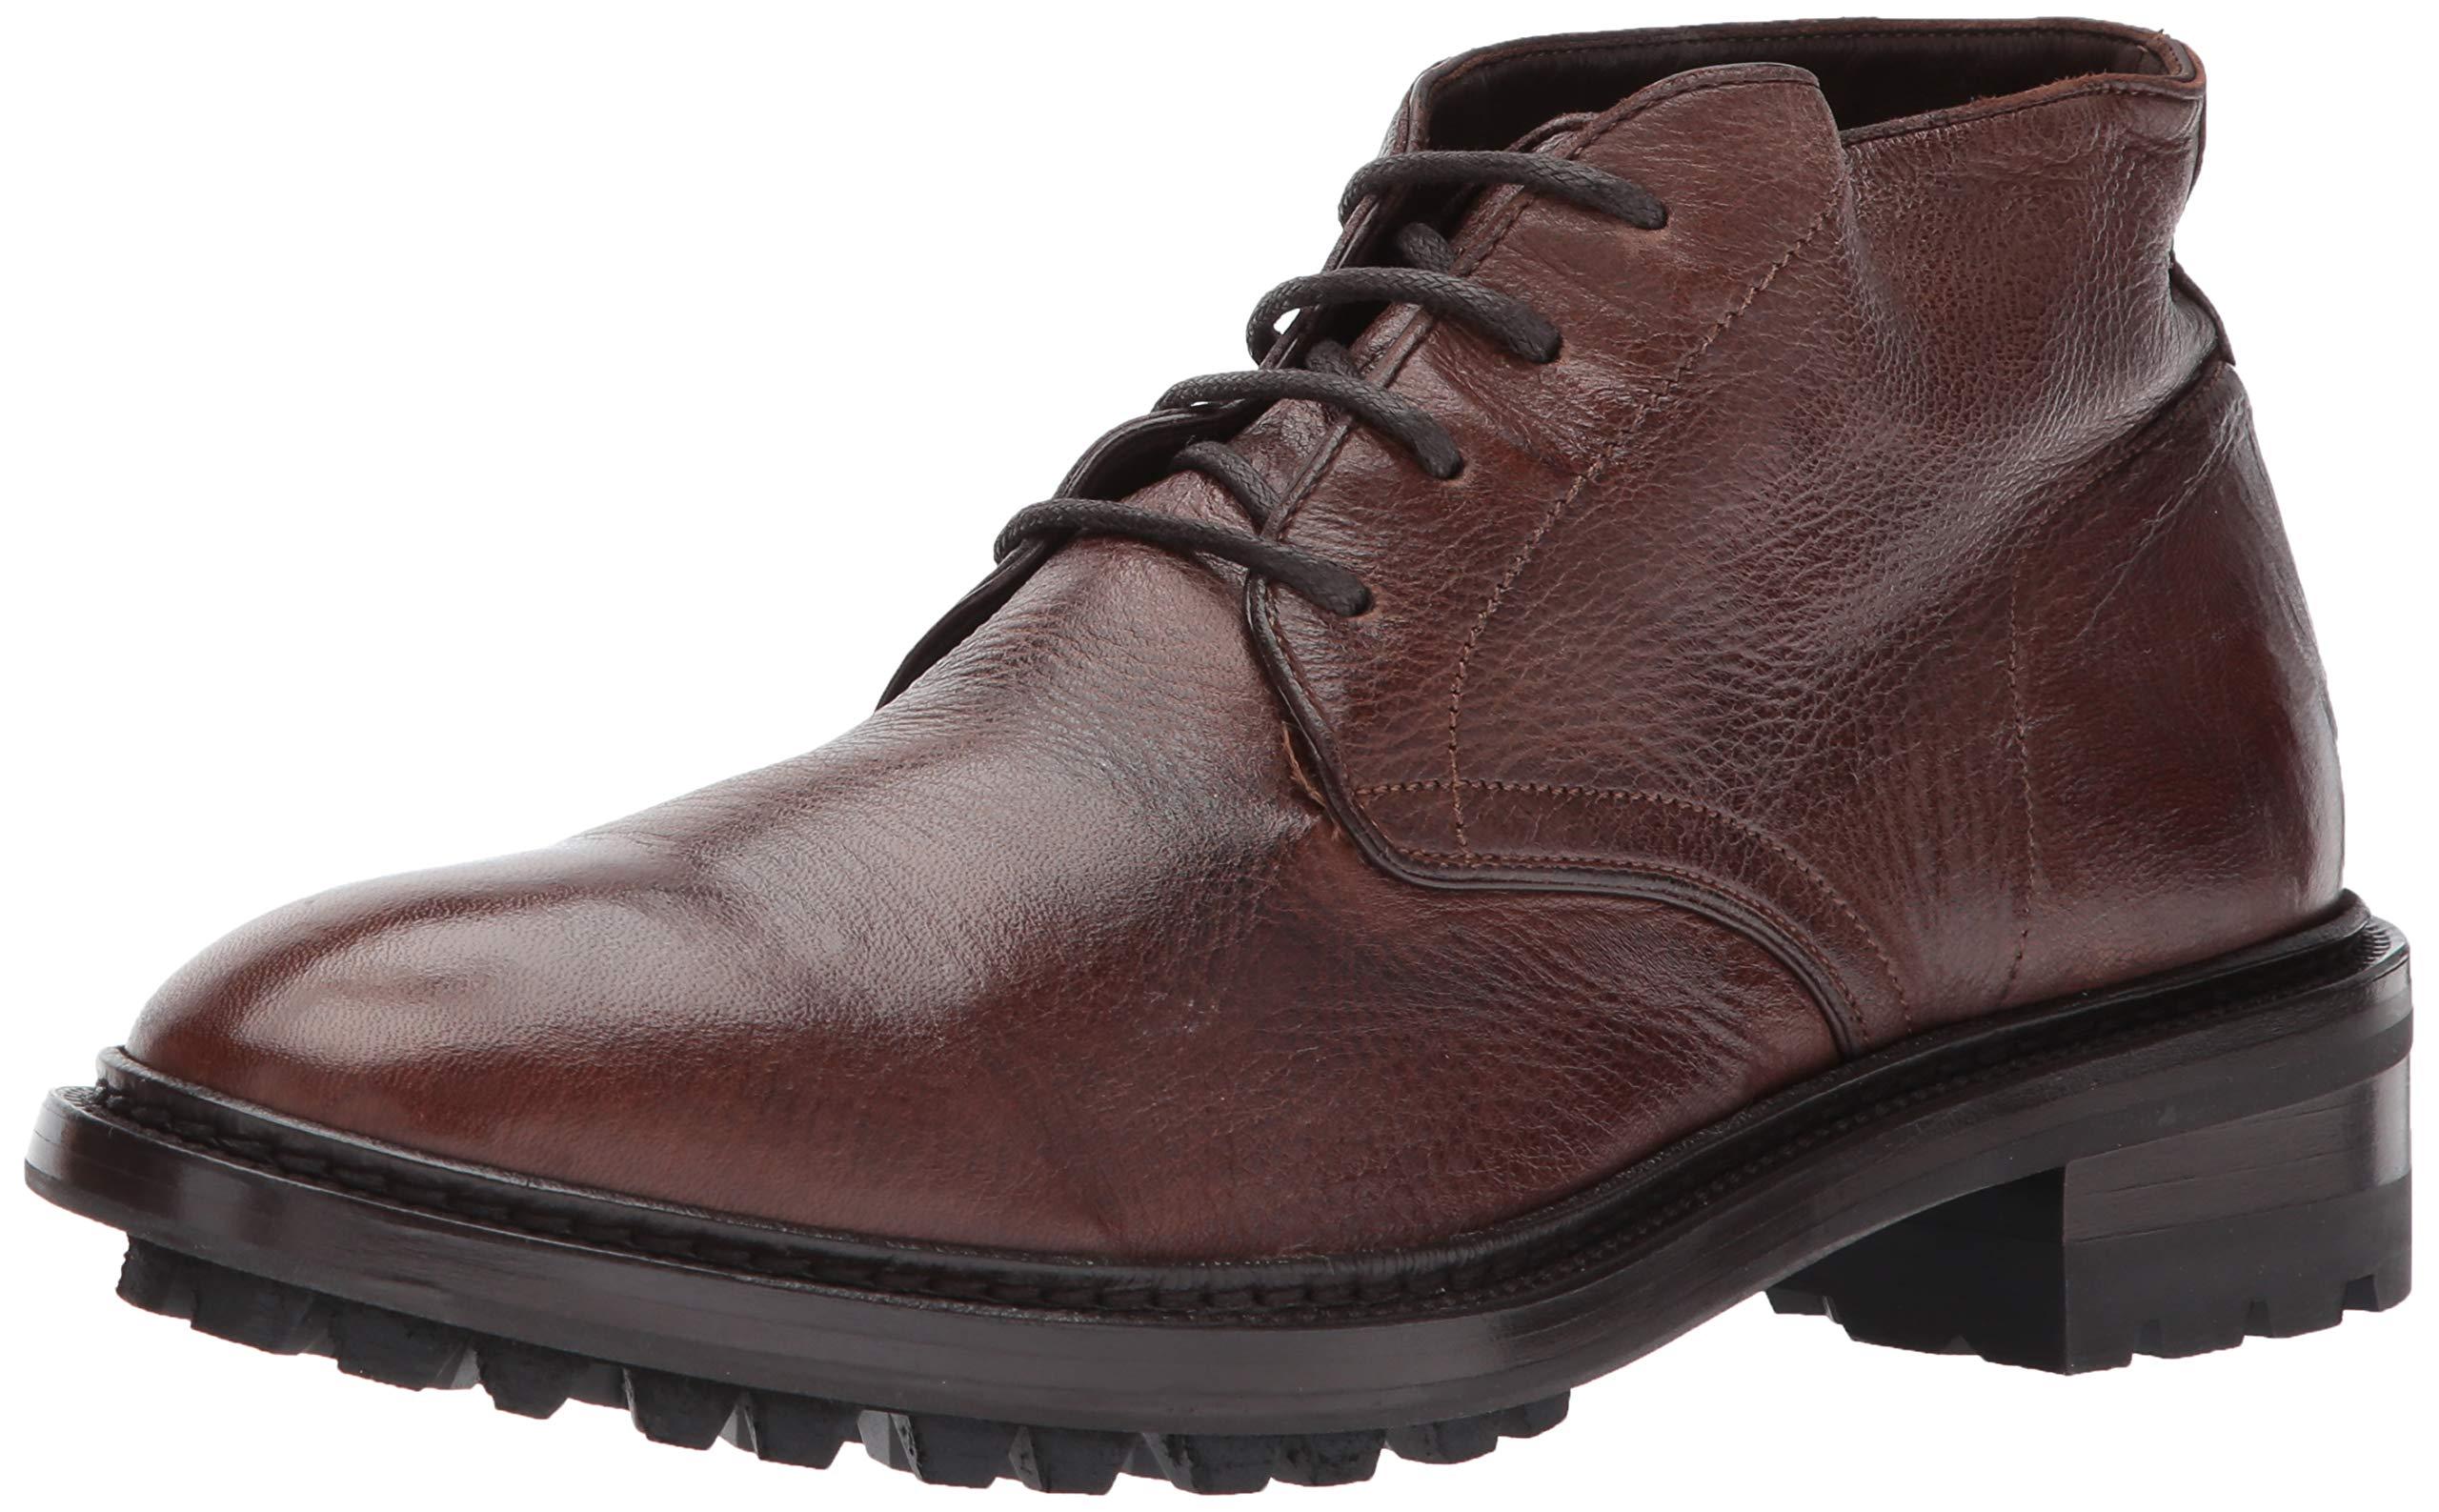 Frye Men's Greyson Chukka Boot